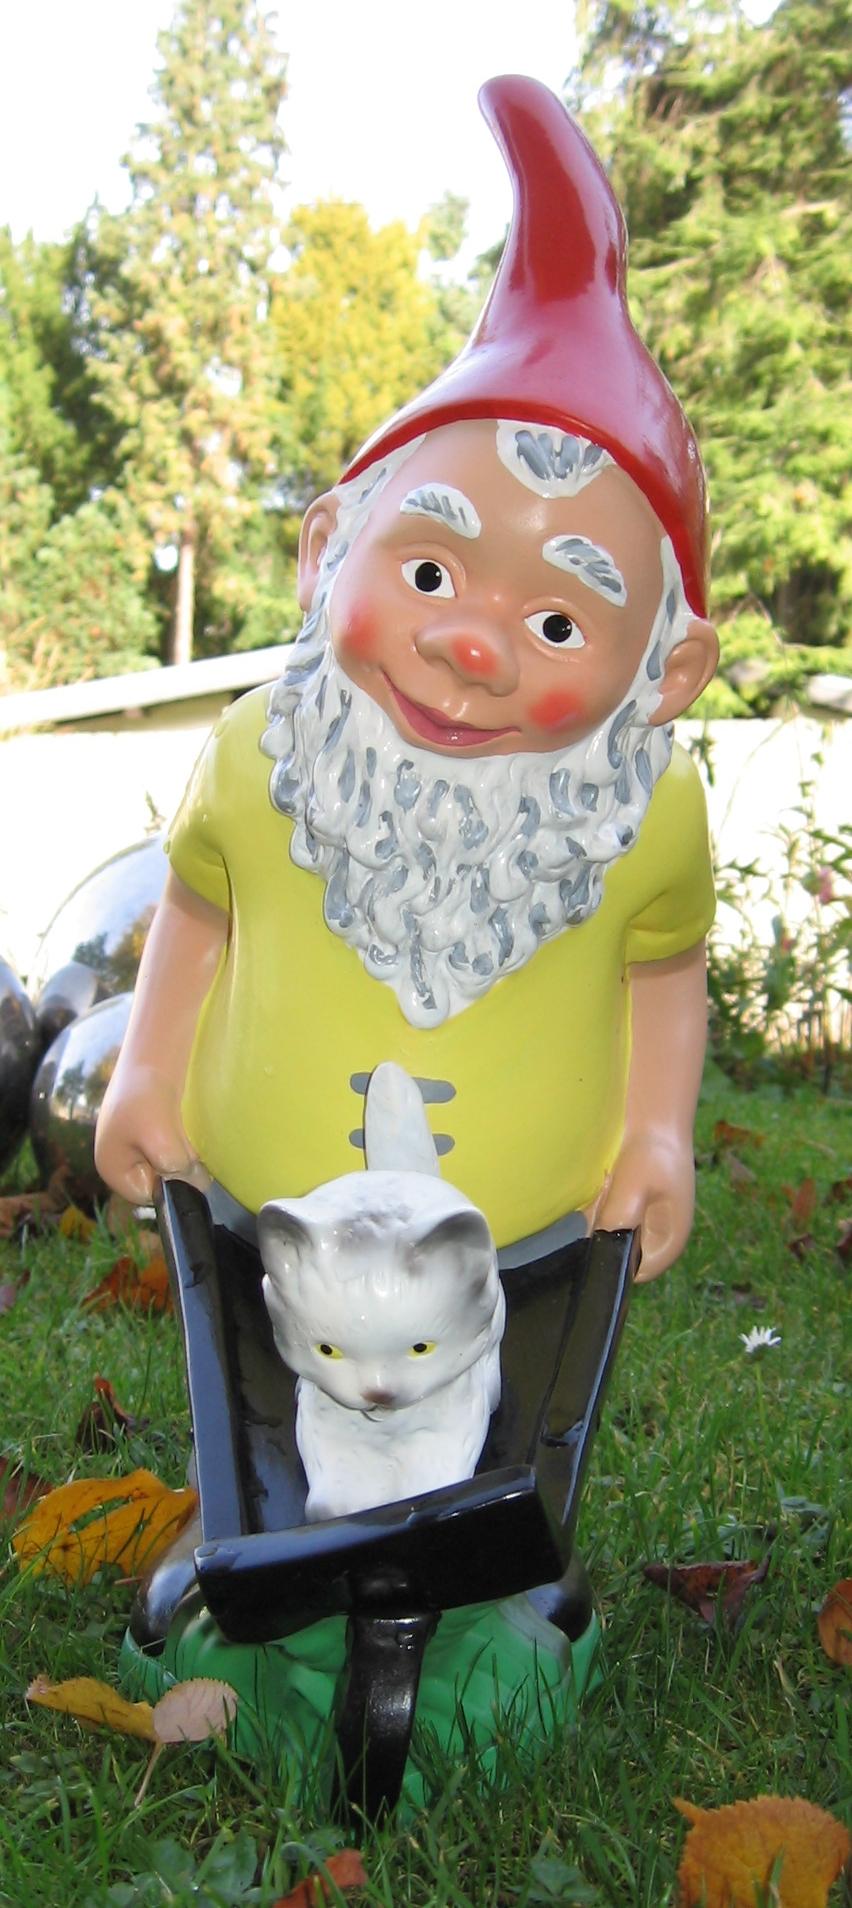 Gnome Garden: Dudley Doright: January 2012